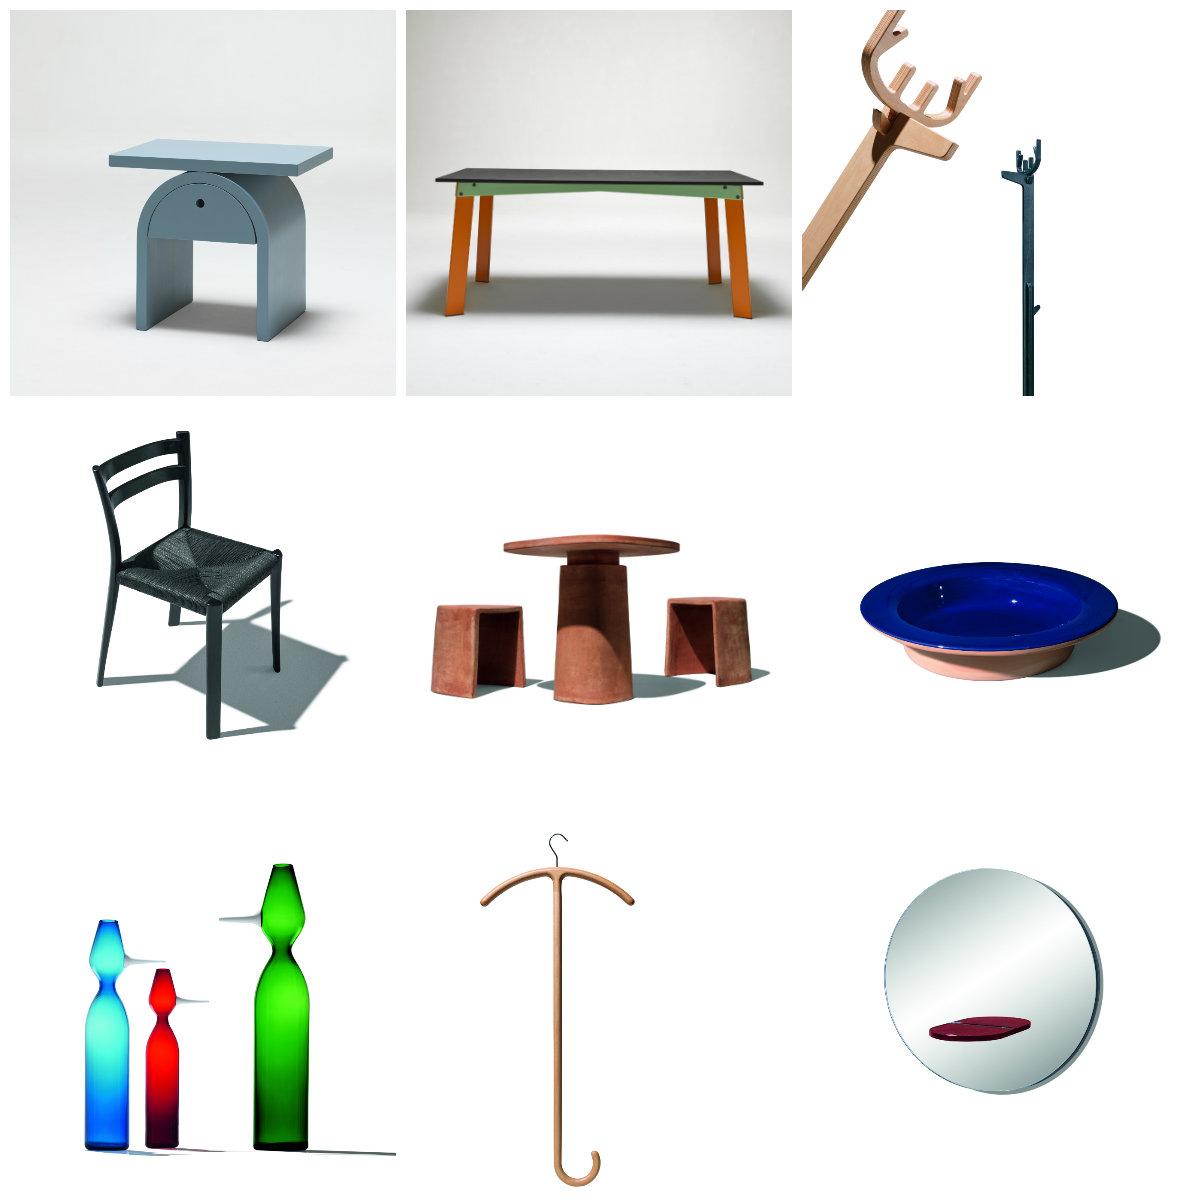 internoitaliano-myhomecollection-designlifestyle